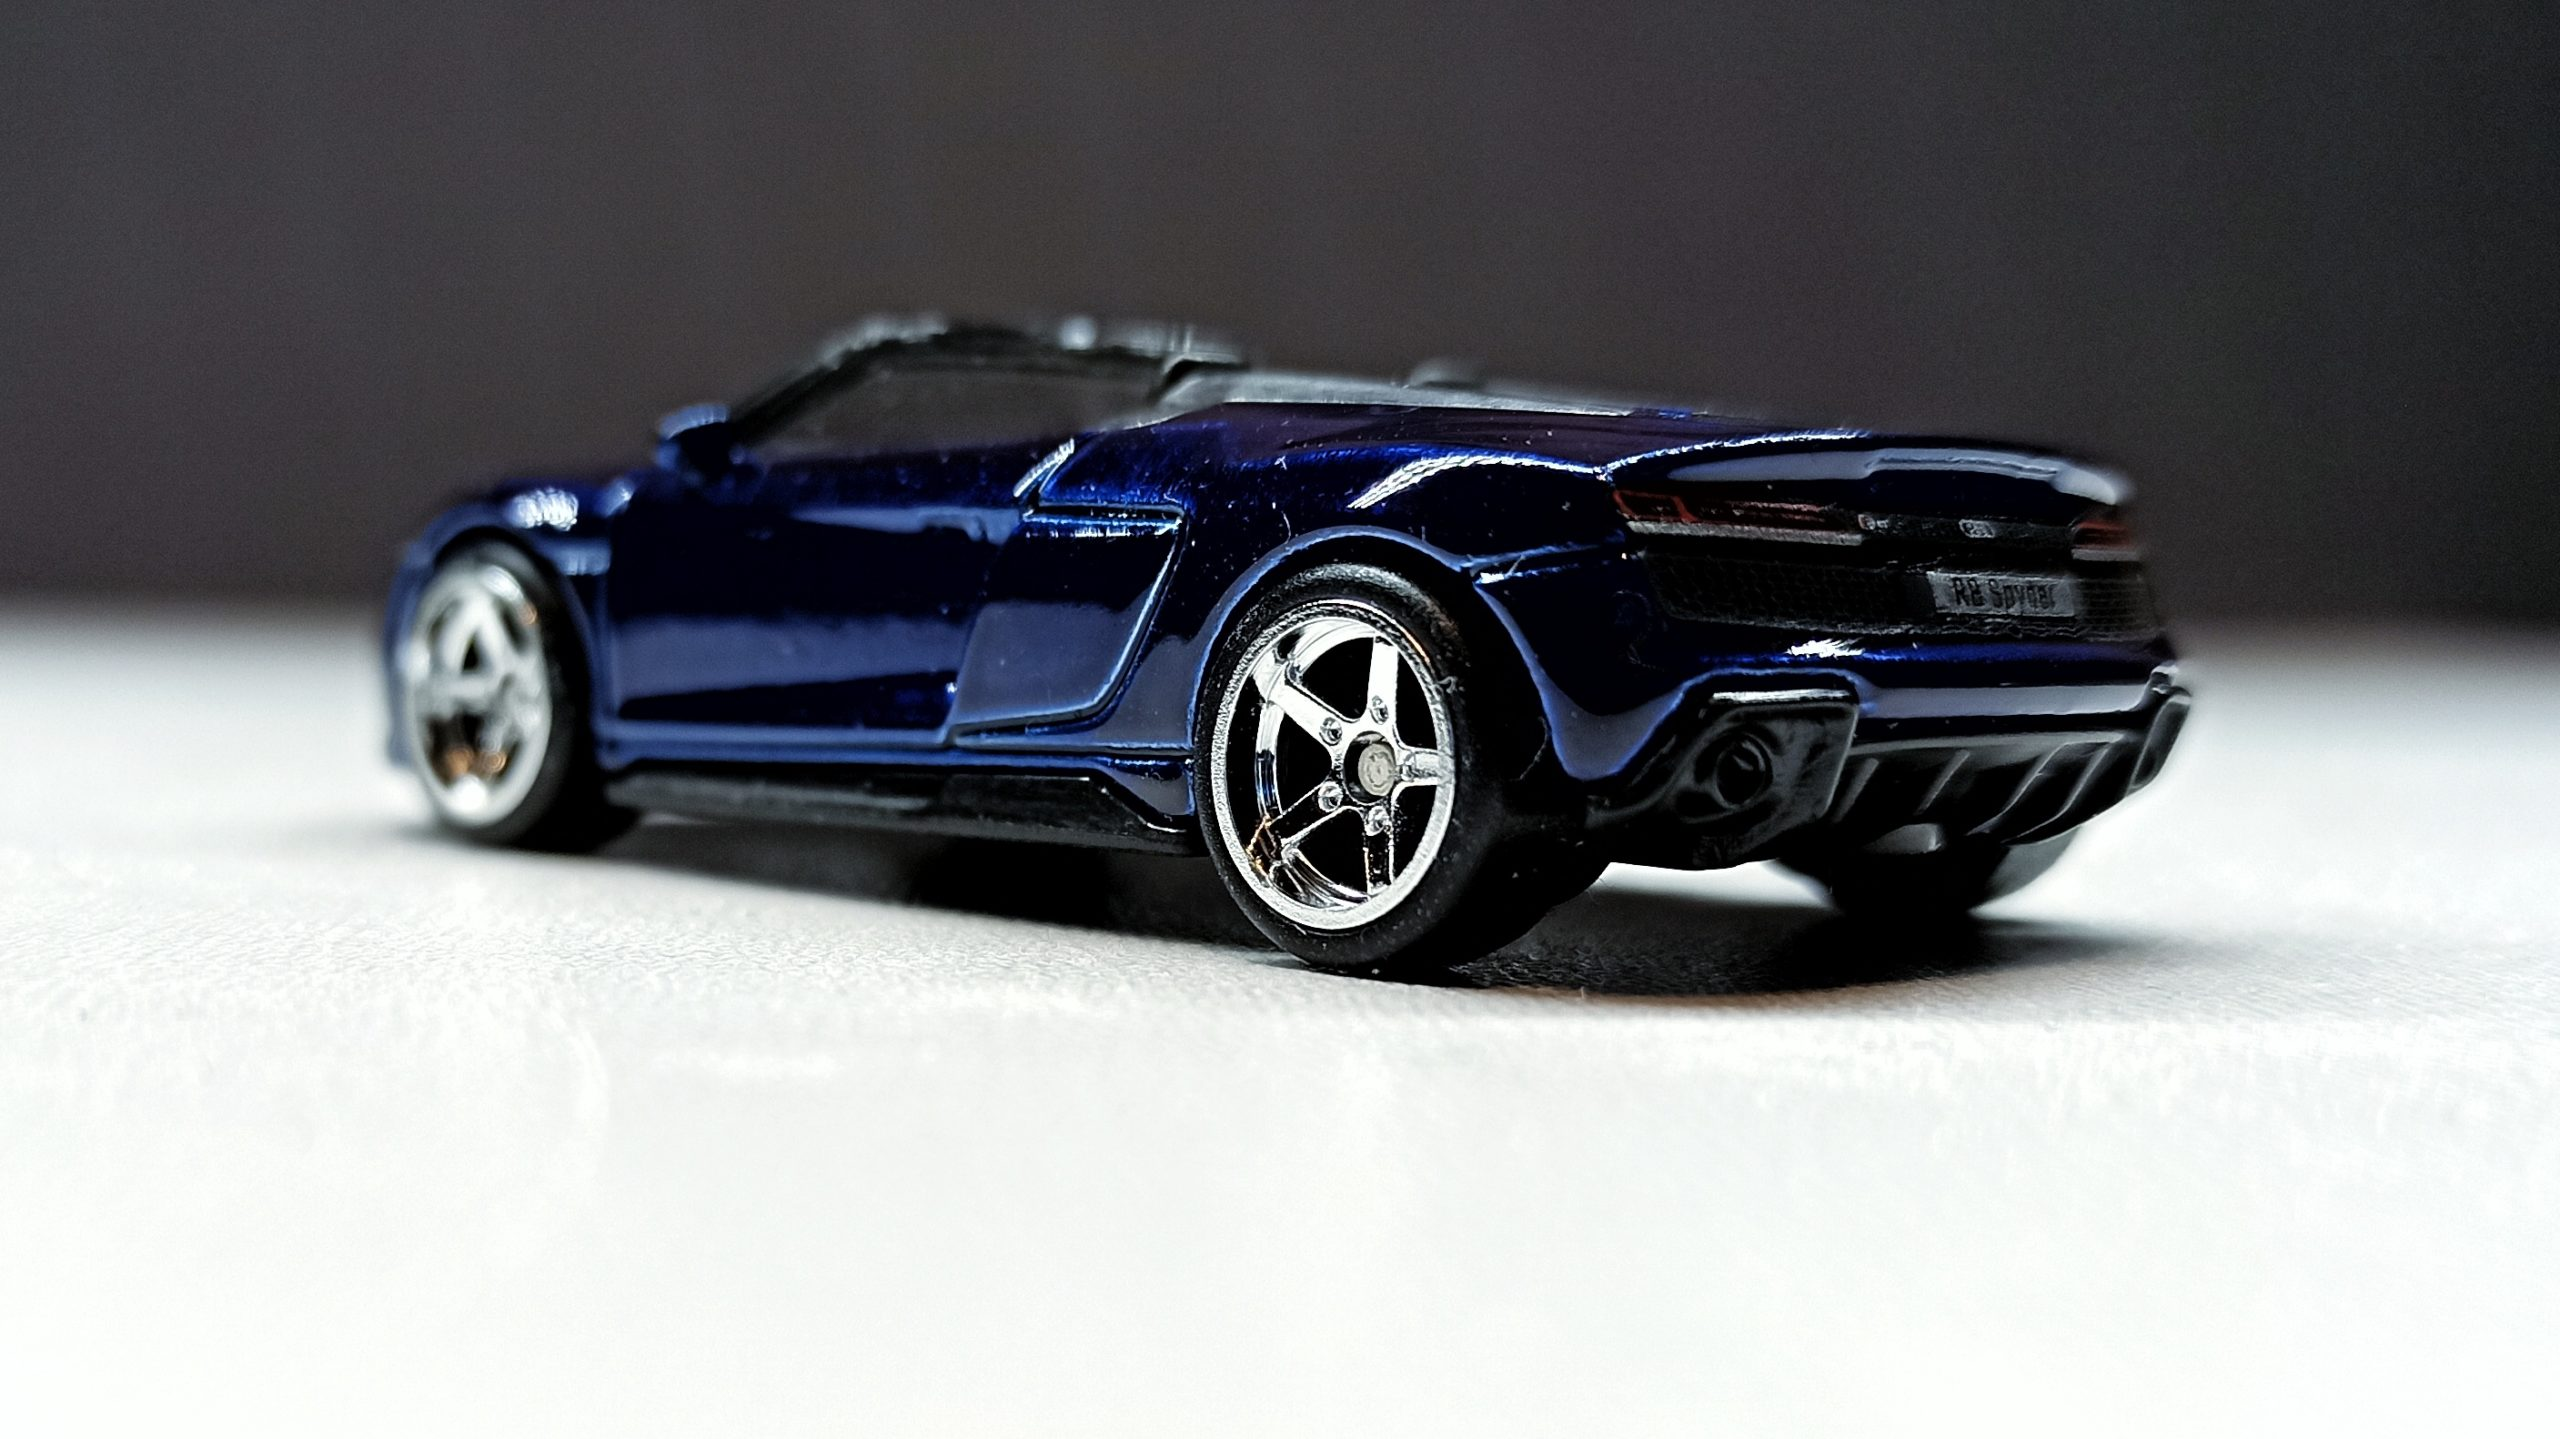 Hot Wheels 2019 Audi R8 Spyder 2021 (211/250) HW Exotics (4/10) indigo blue Super Treasure Hunt (STH) side angle